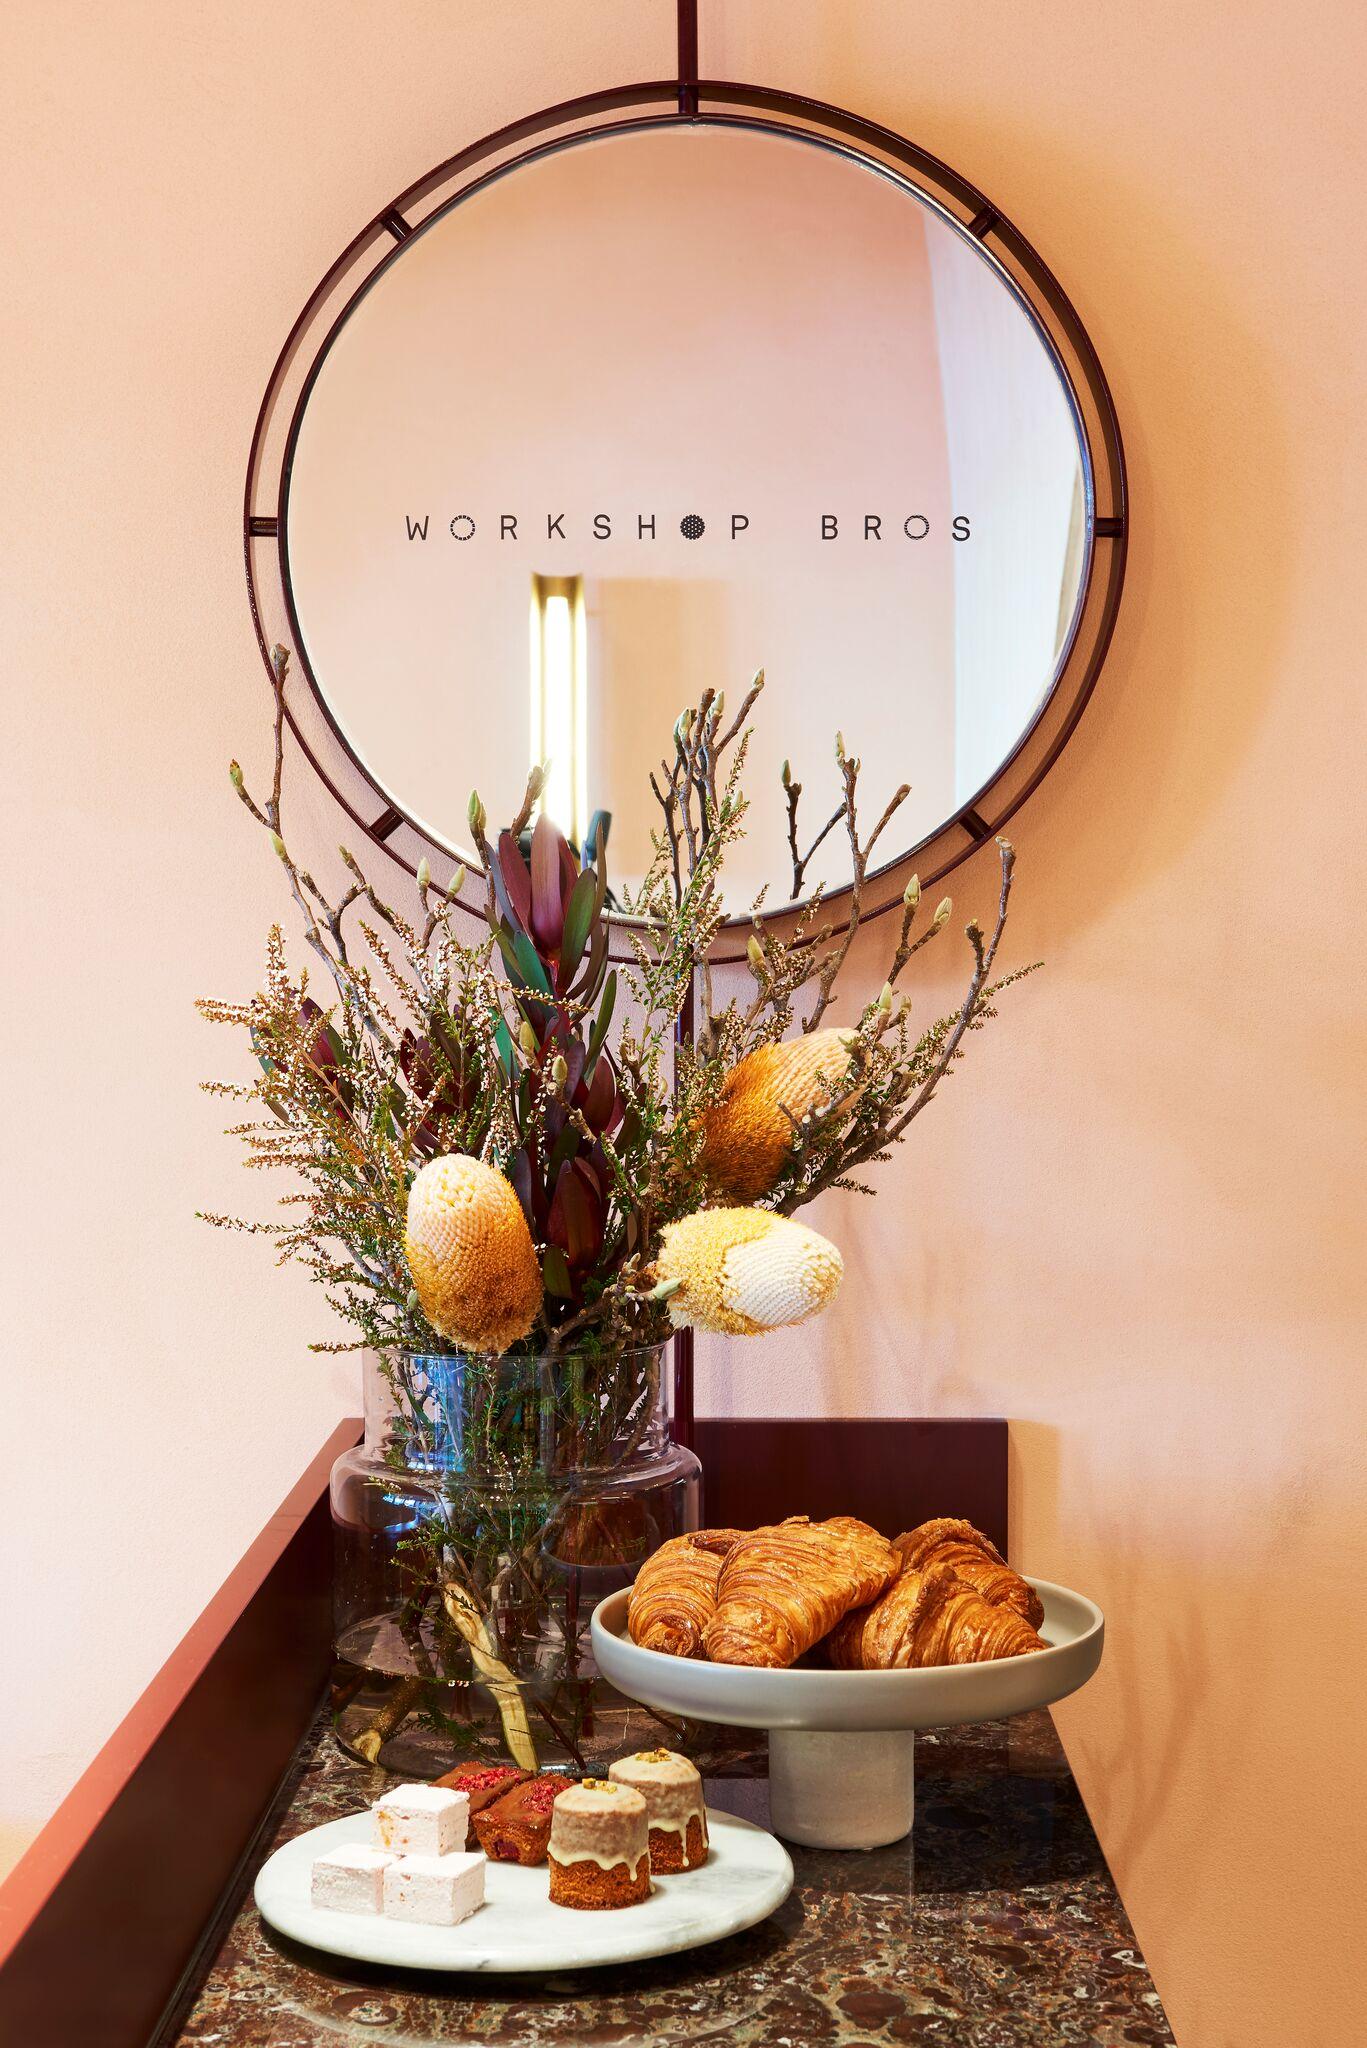 Workshop Bros - Glen Waverley - Interior - Food Win Design - Image 10